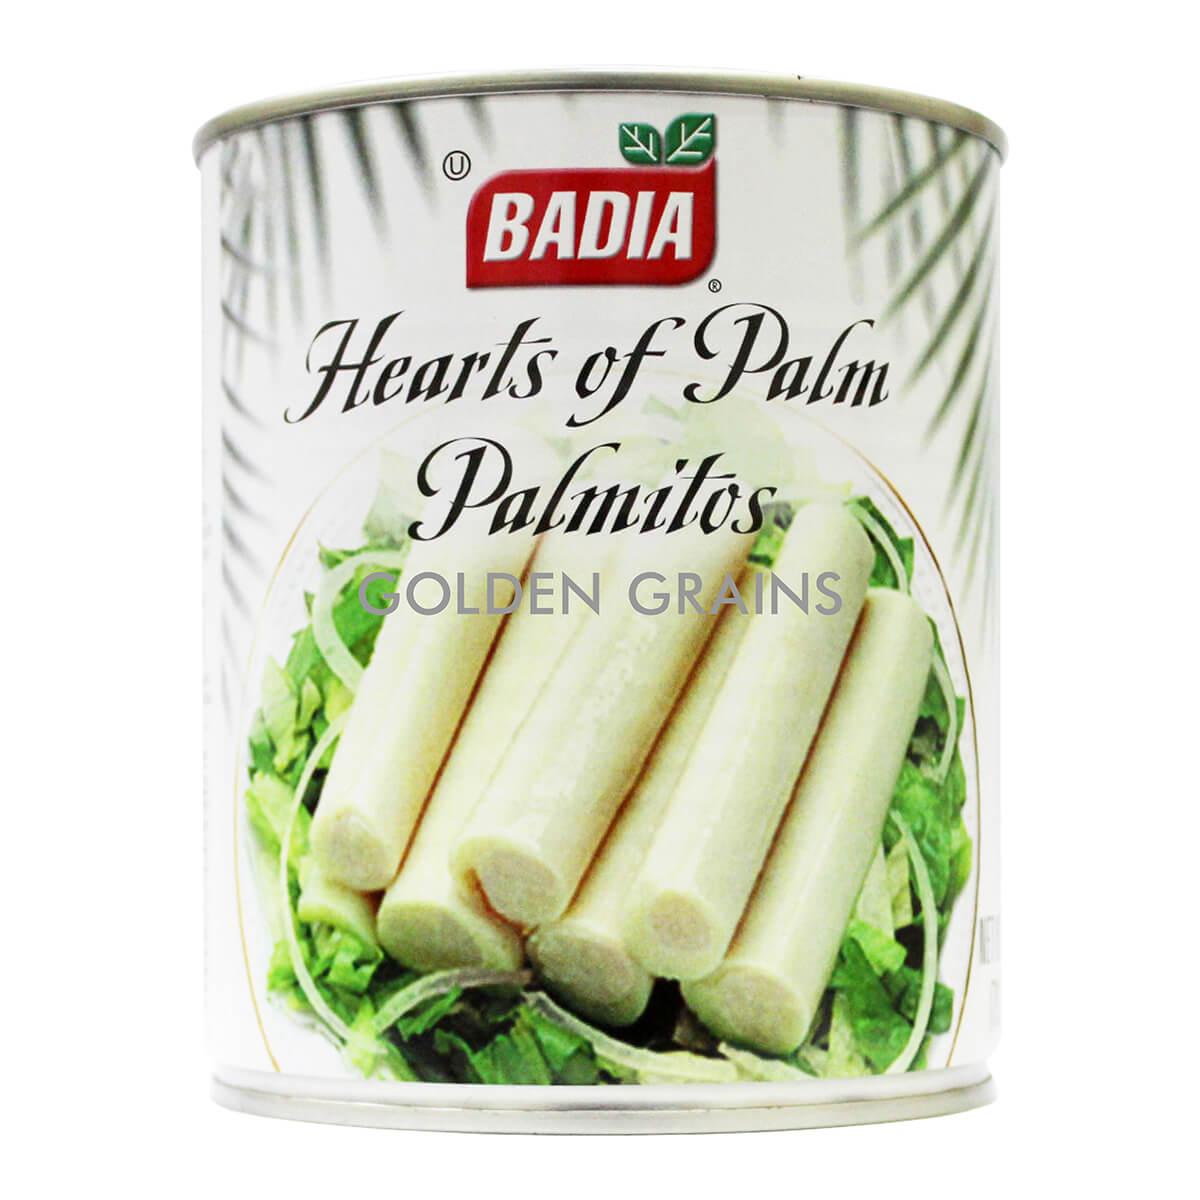 Golden Grains Badia - Hearts of Palm - Front.jpg